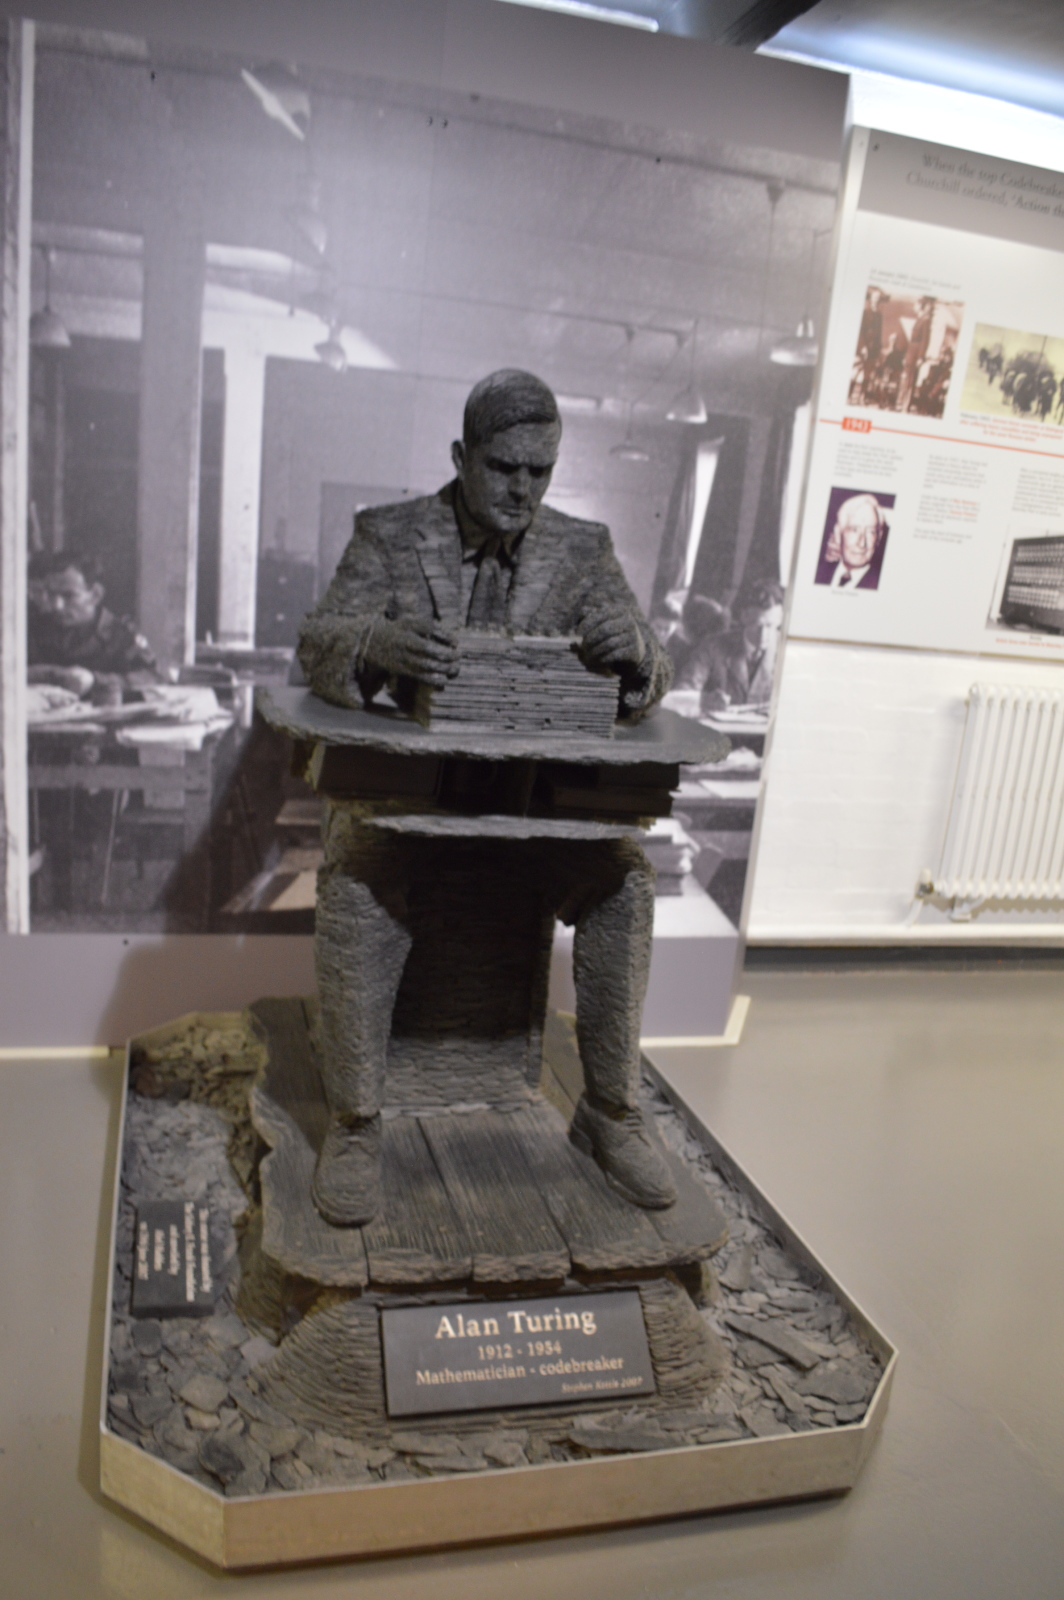 Turing.jpeg